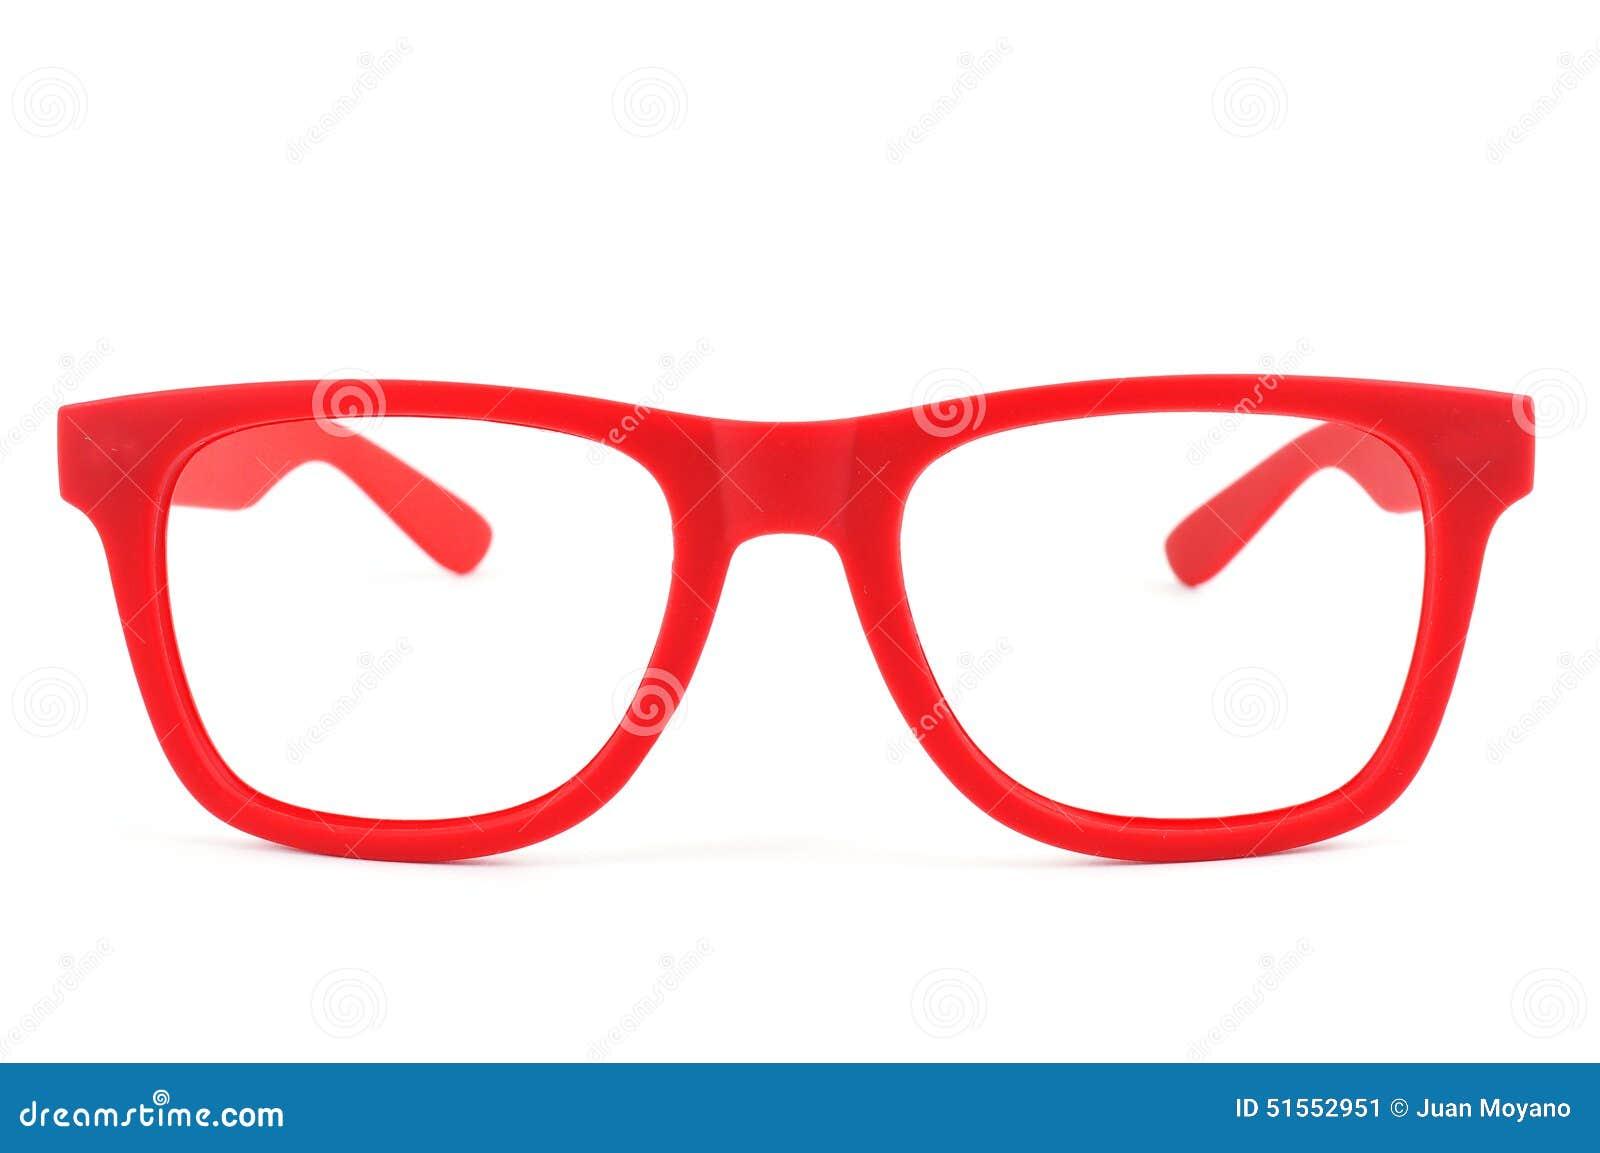 680c1048fd7827 Lunettes rouges image stock. Image du distance, optométriste - 51552951